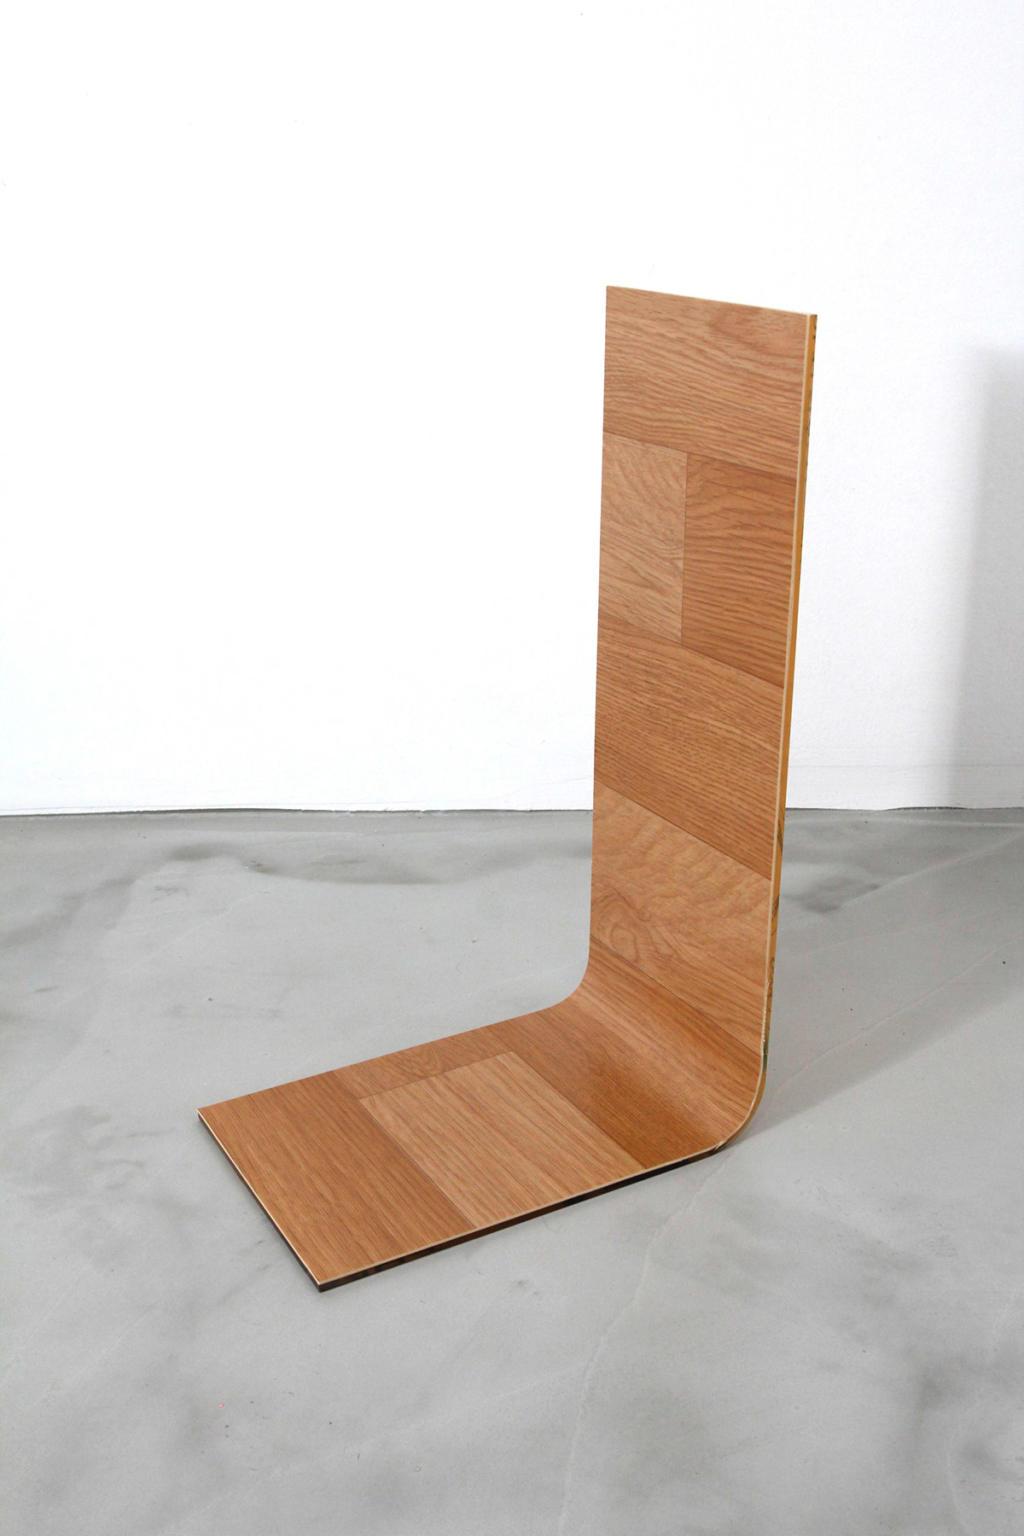 ADearFriend + Chris Ro Plastic Wood — Series 2